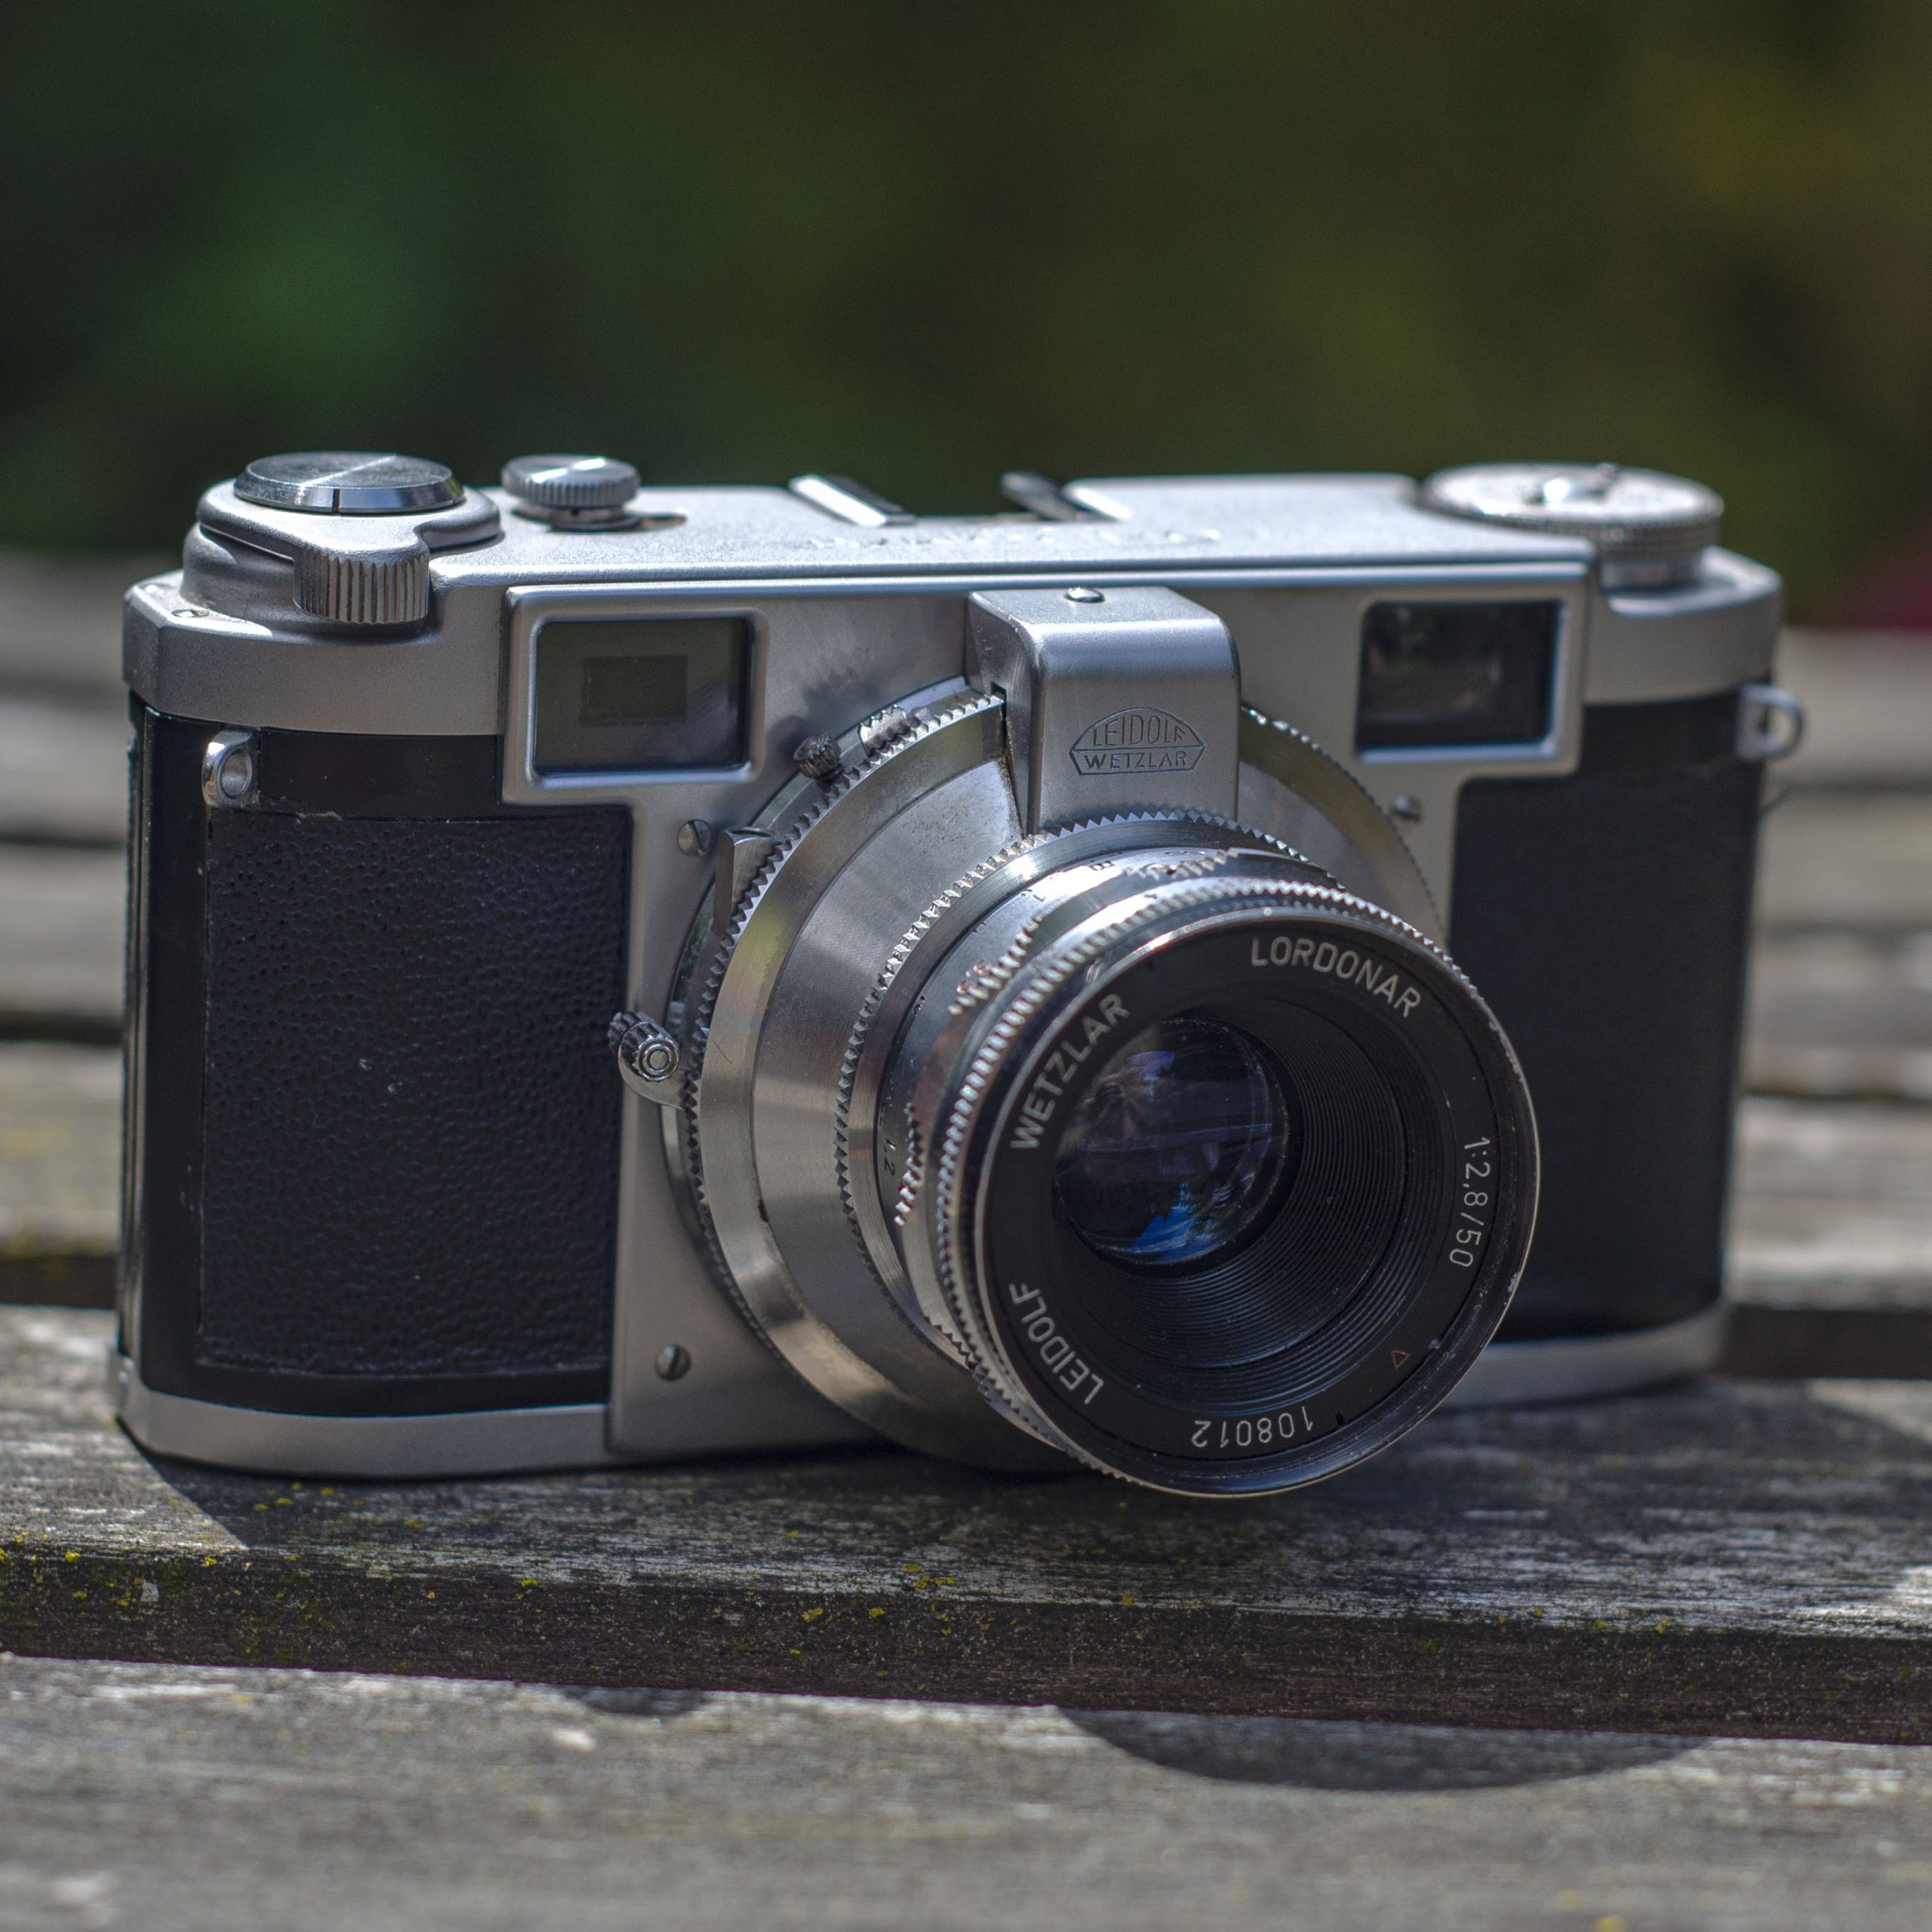 Lordomat 35mm camera